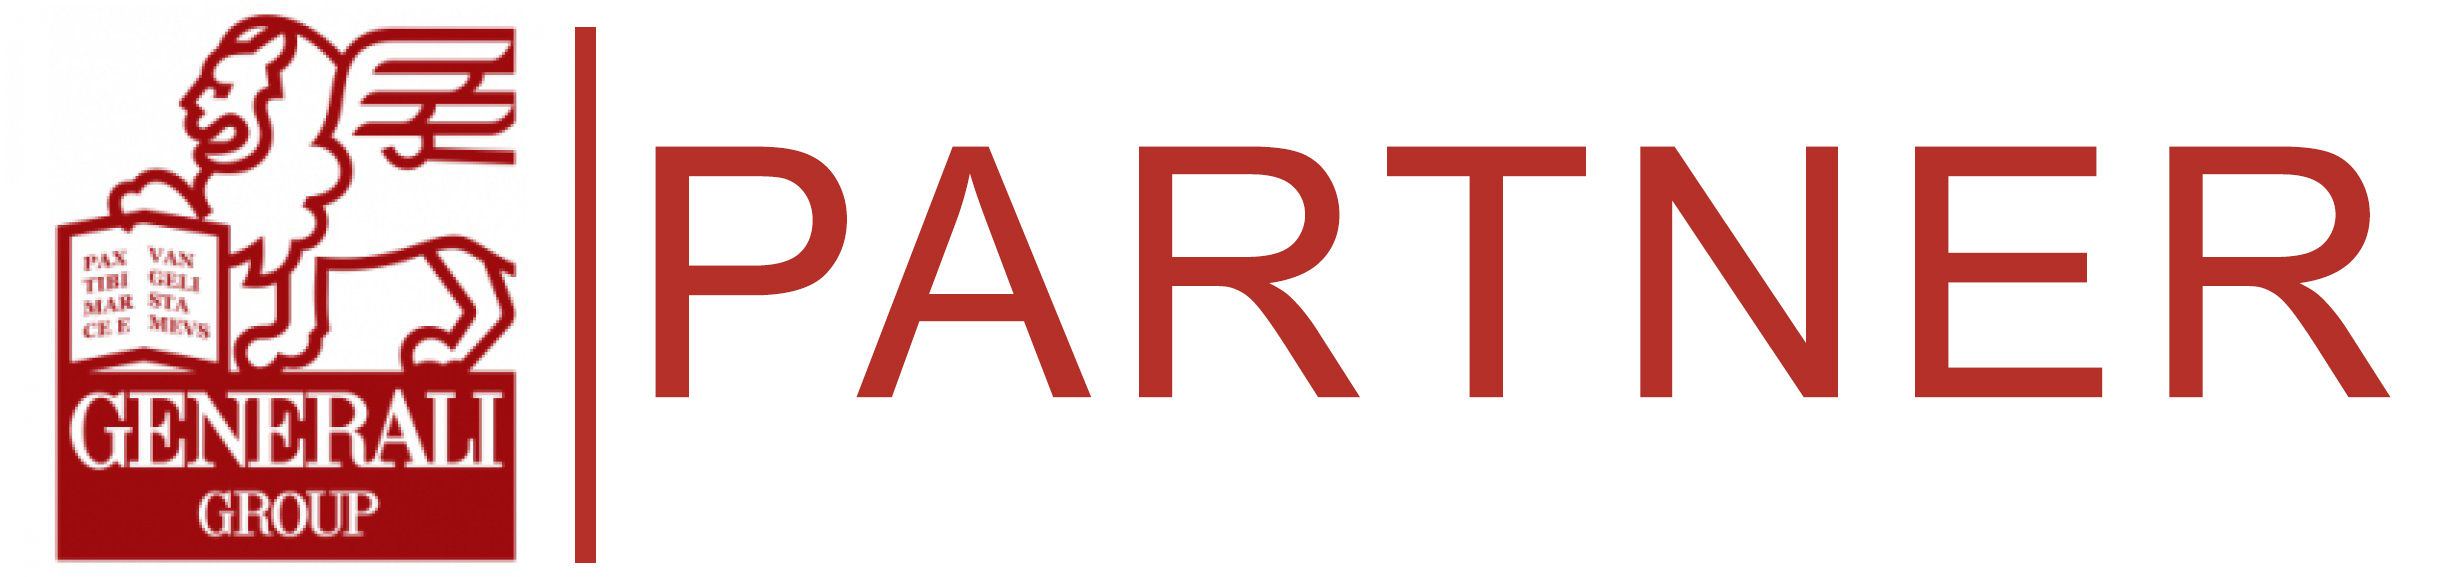 Logo partenaire Generali Assurance